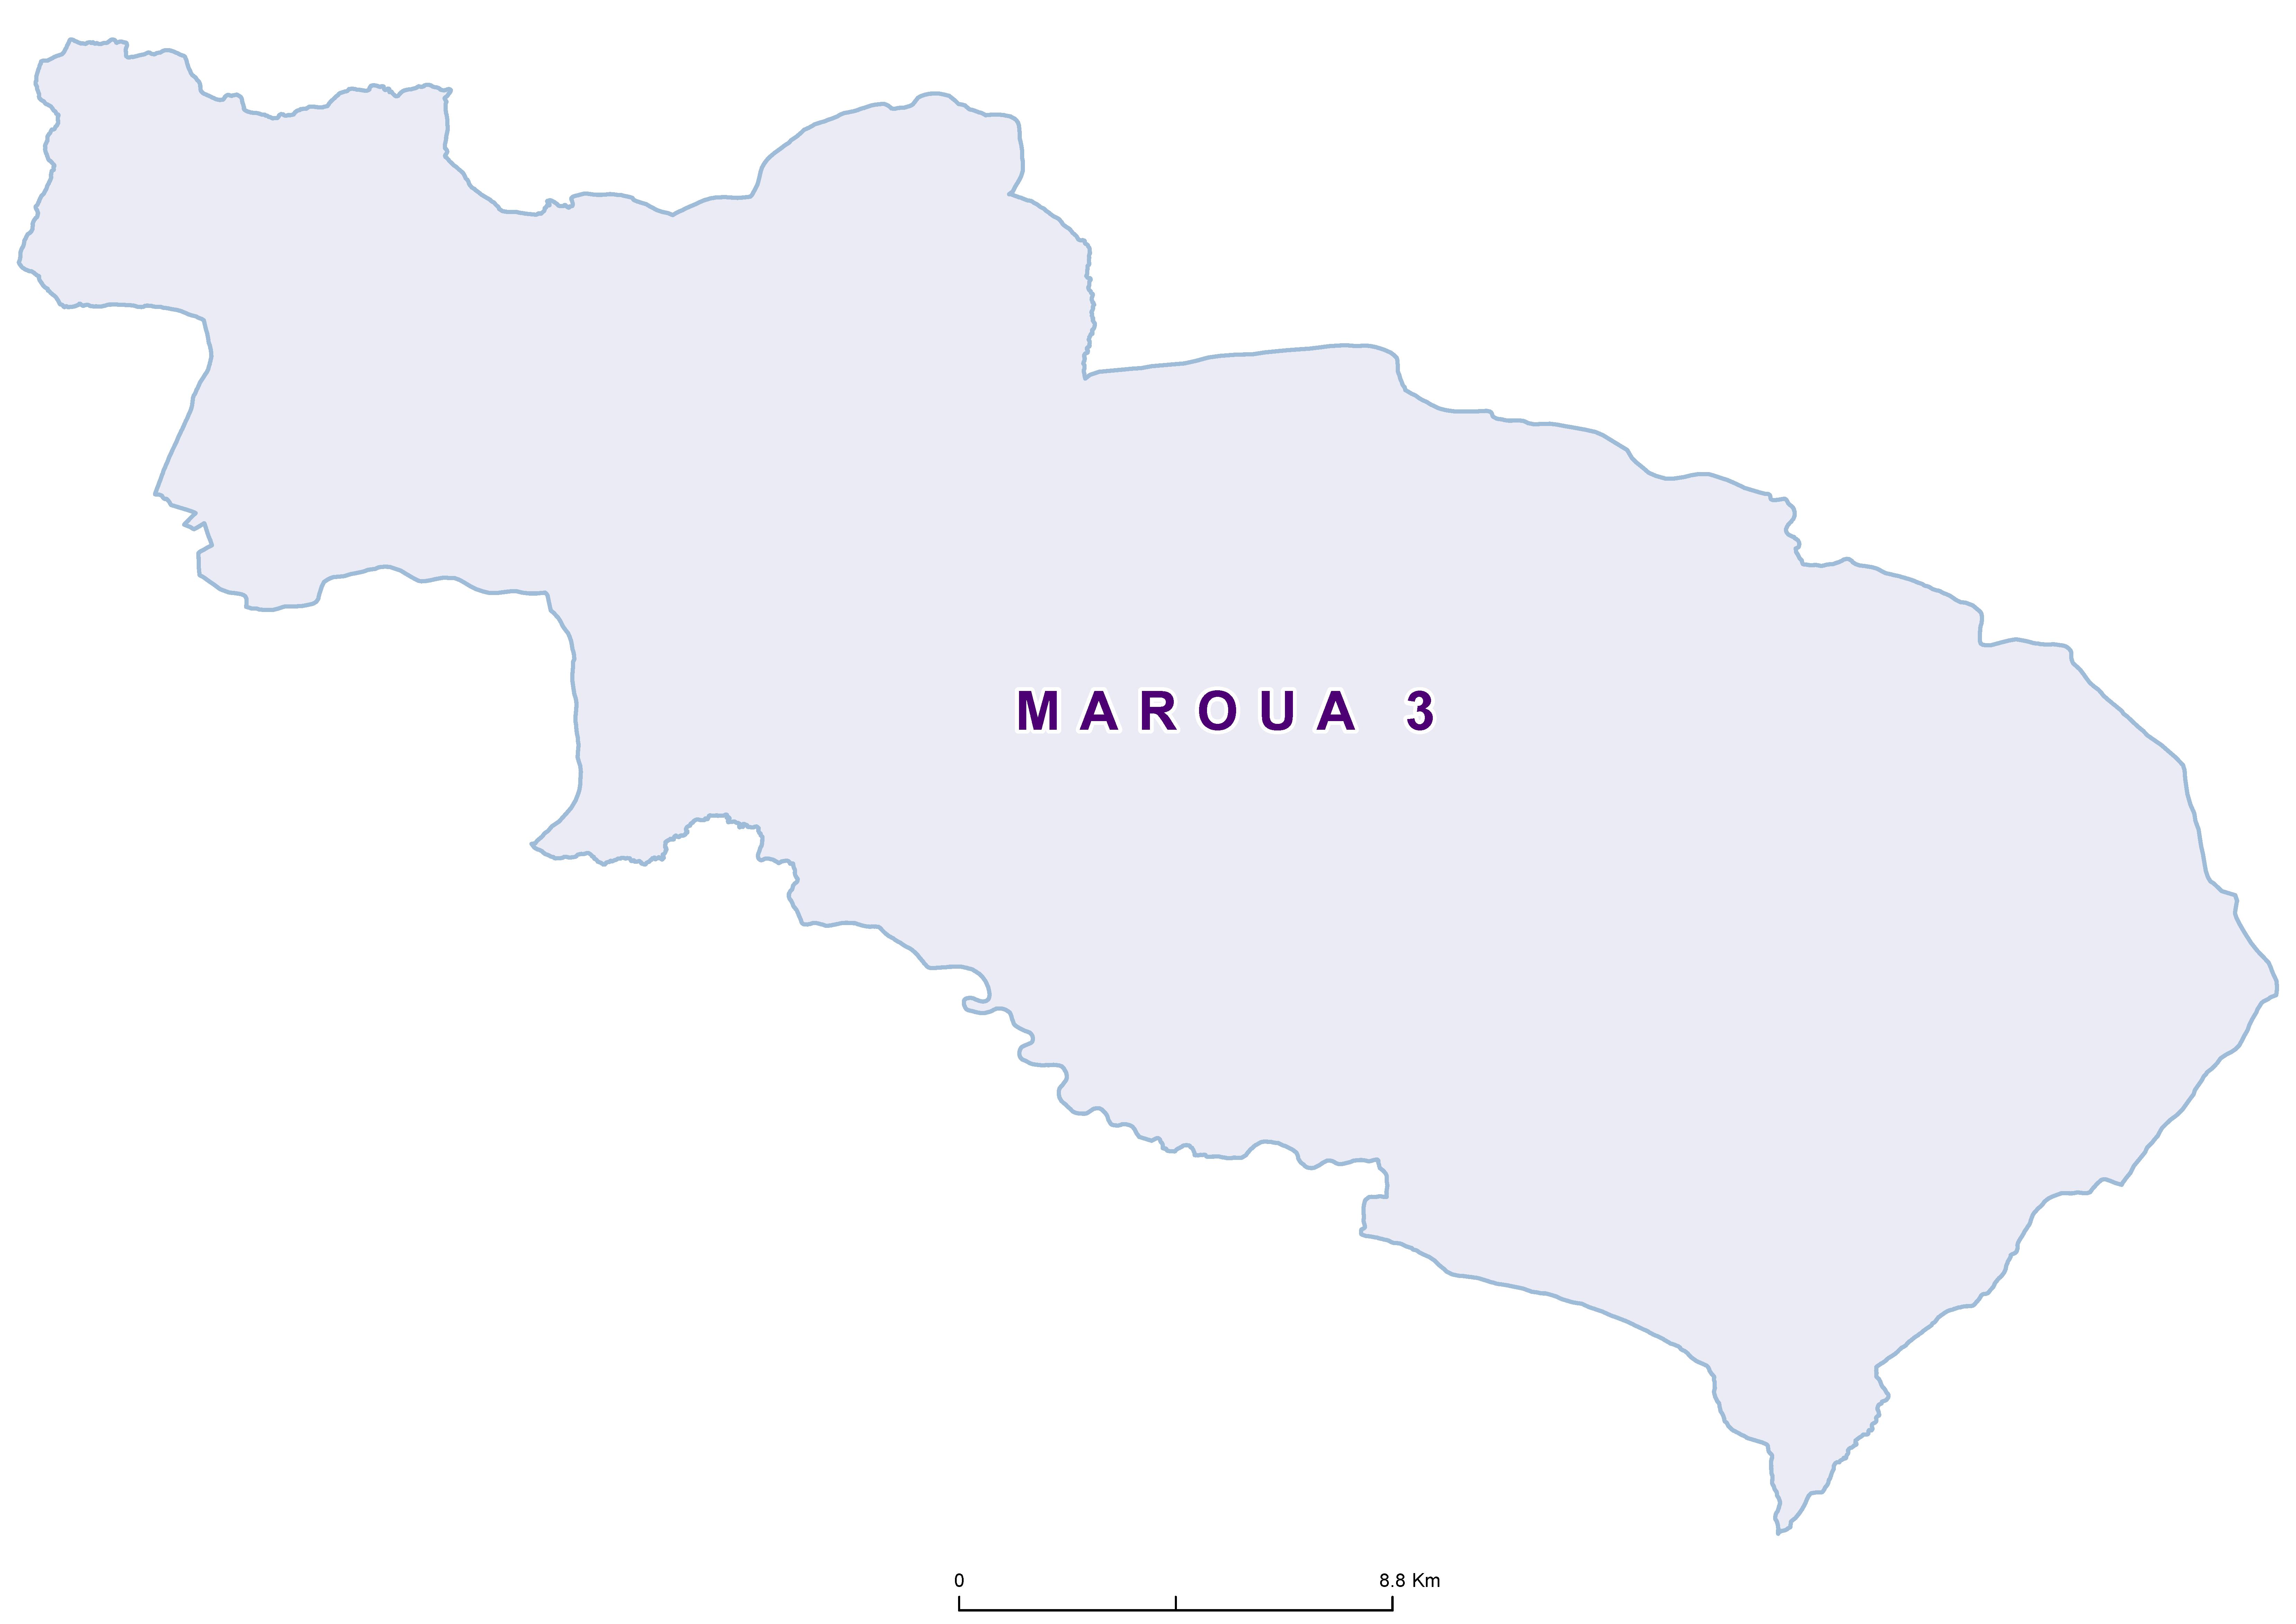 Maroua 3 Max STH 20180001